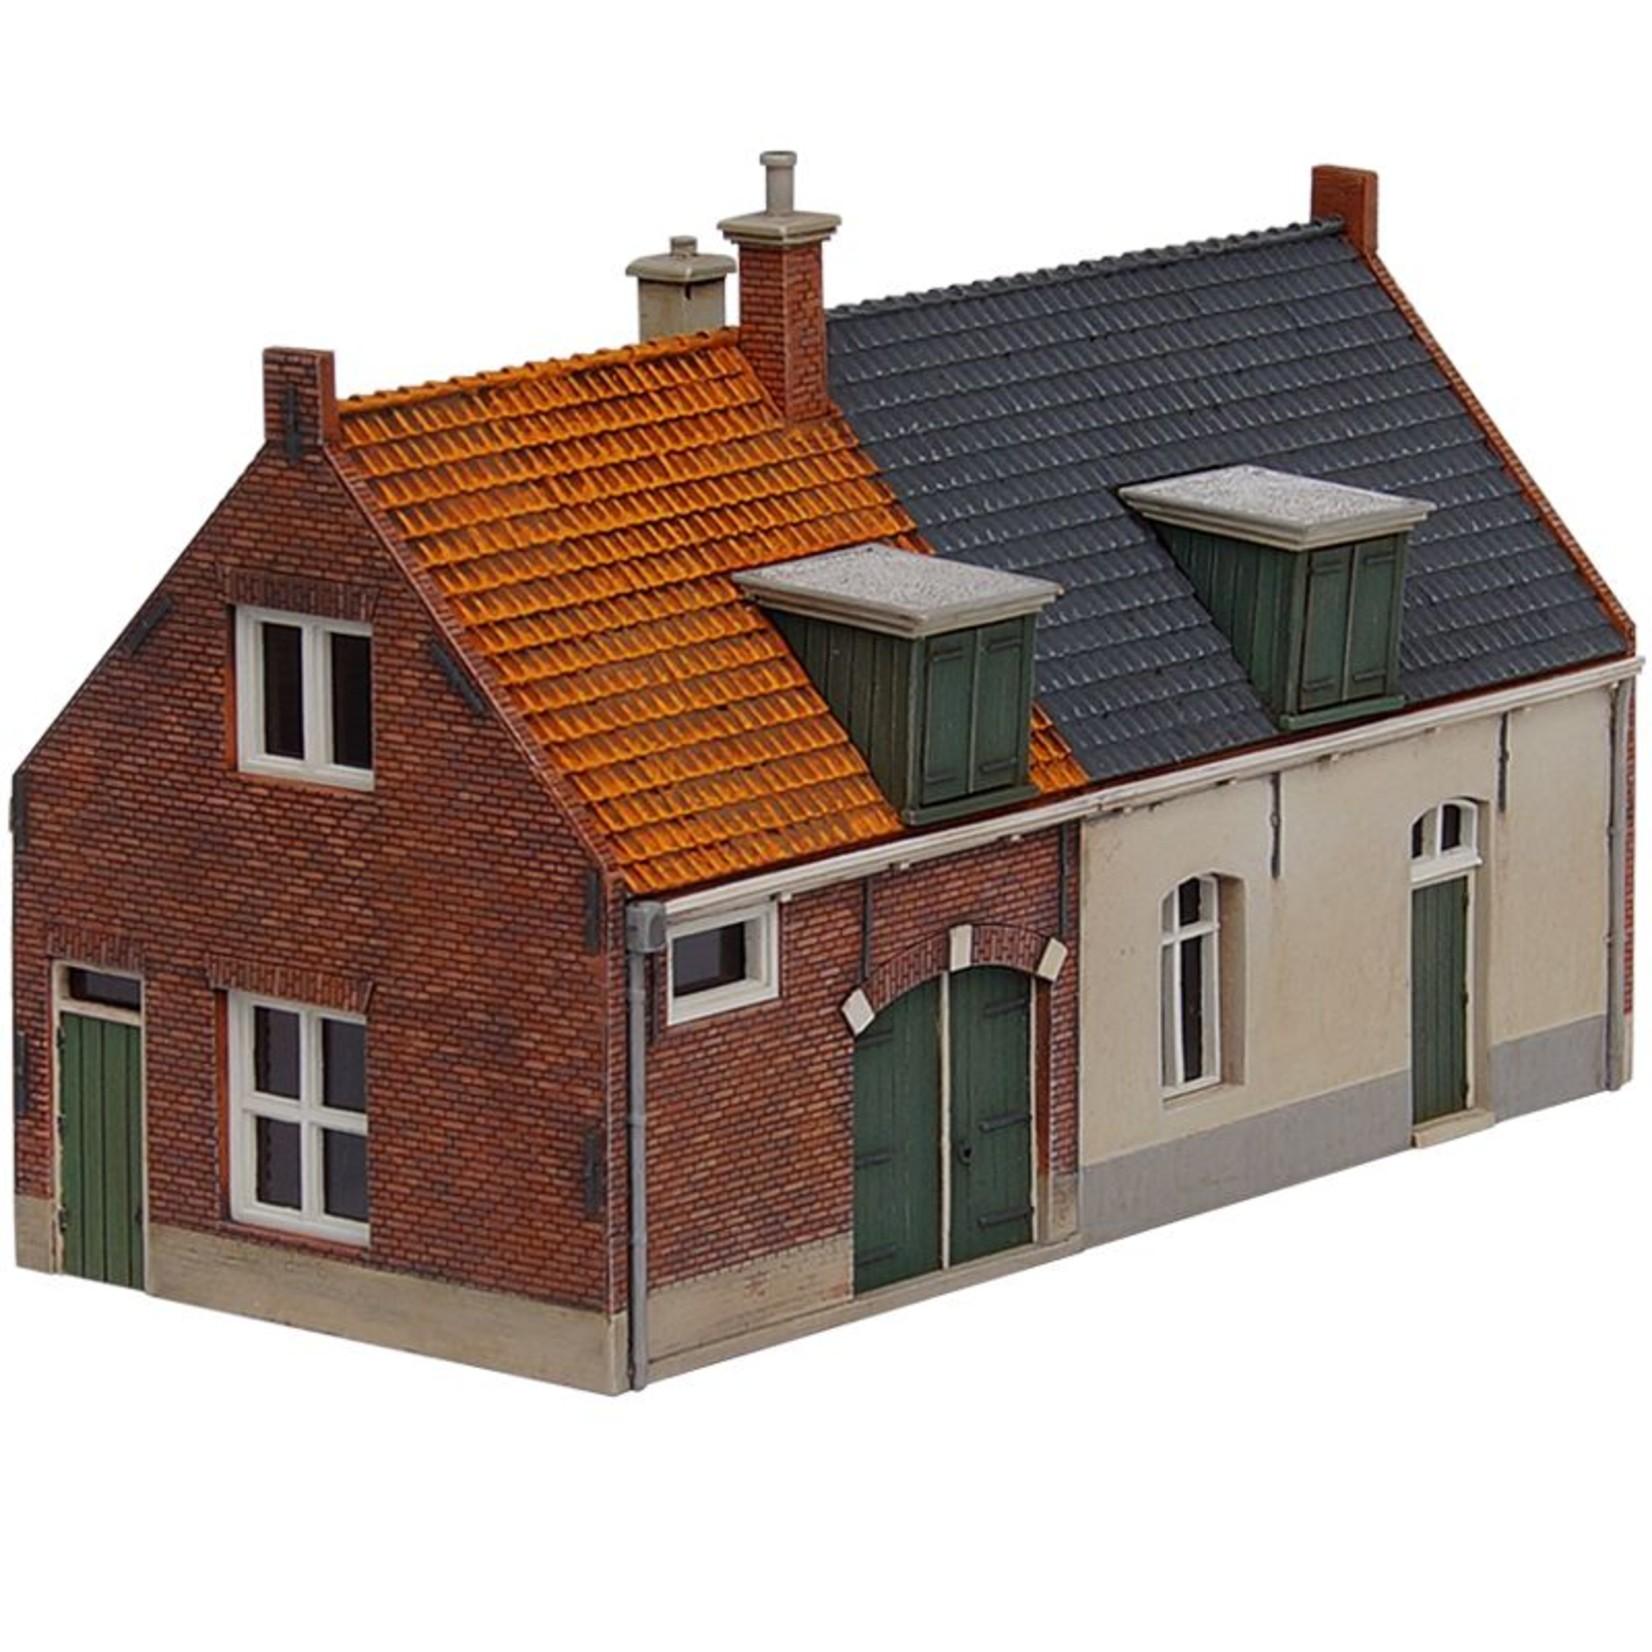 City house 19th century